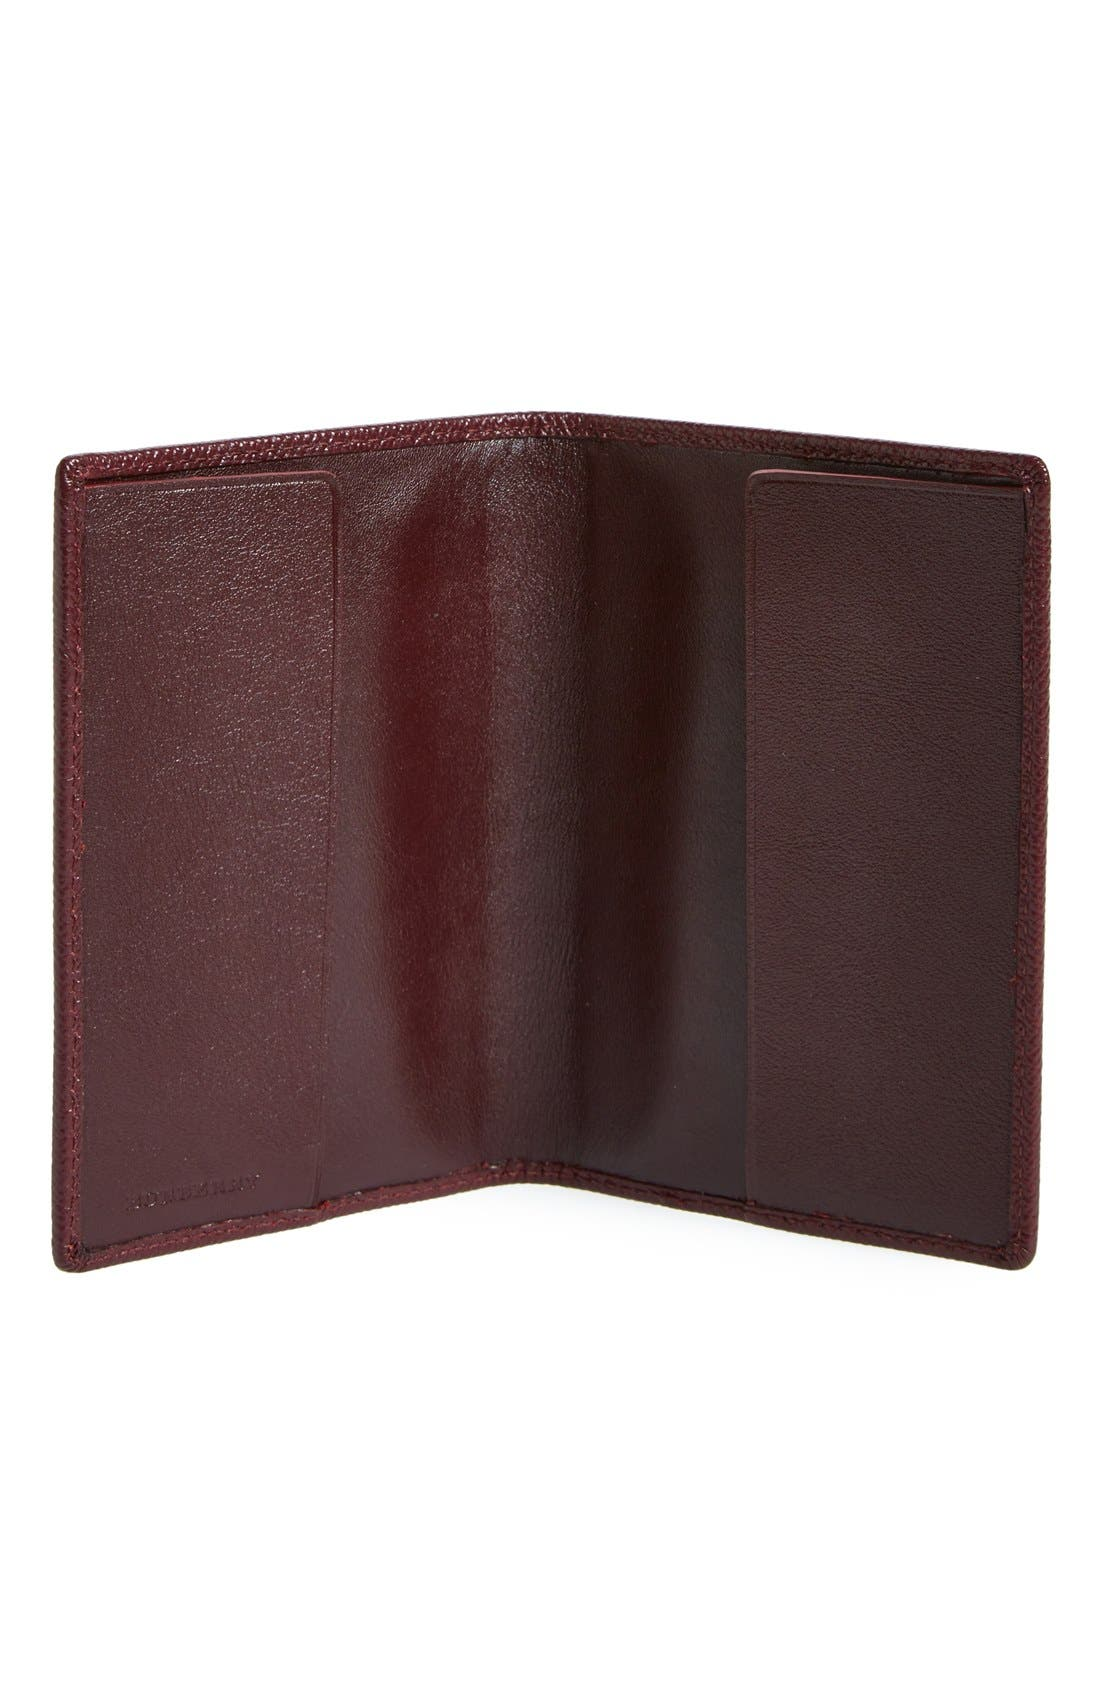 BURBERRY,                             Leather Passport Case,                             Alternate thumbnail 2, color,                             600